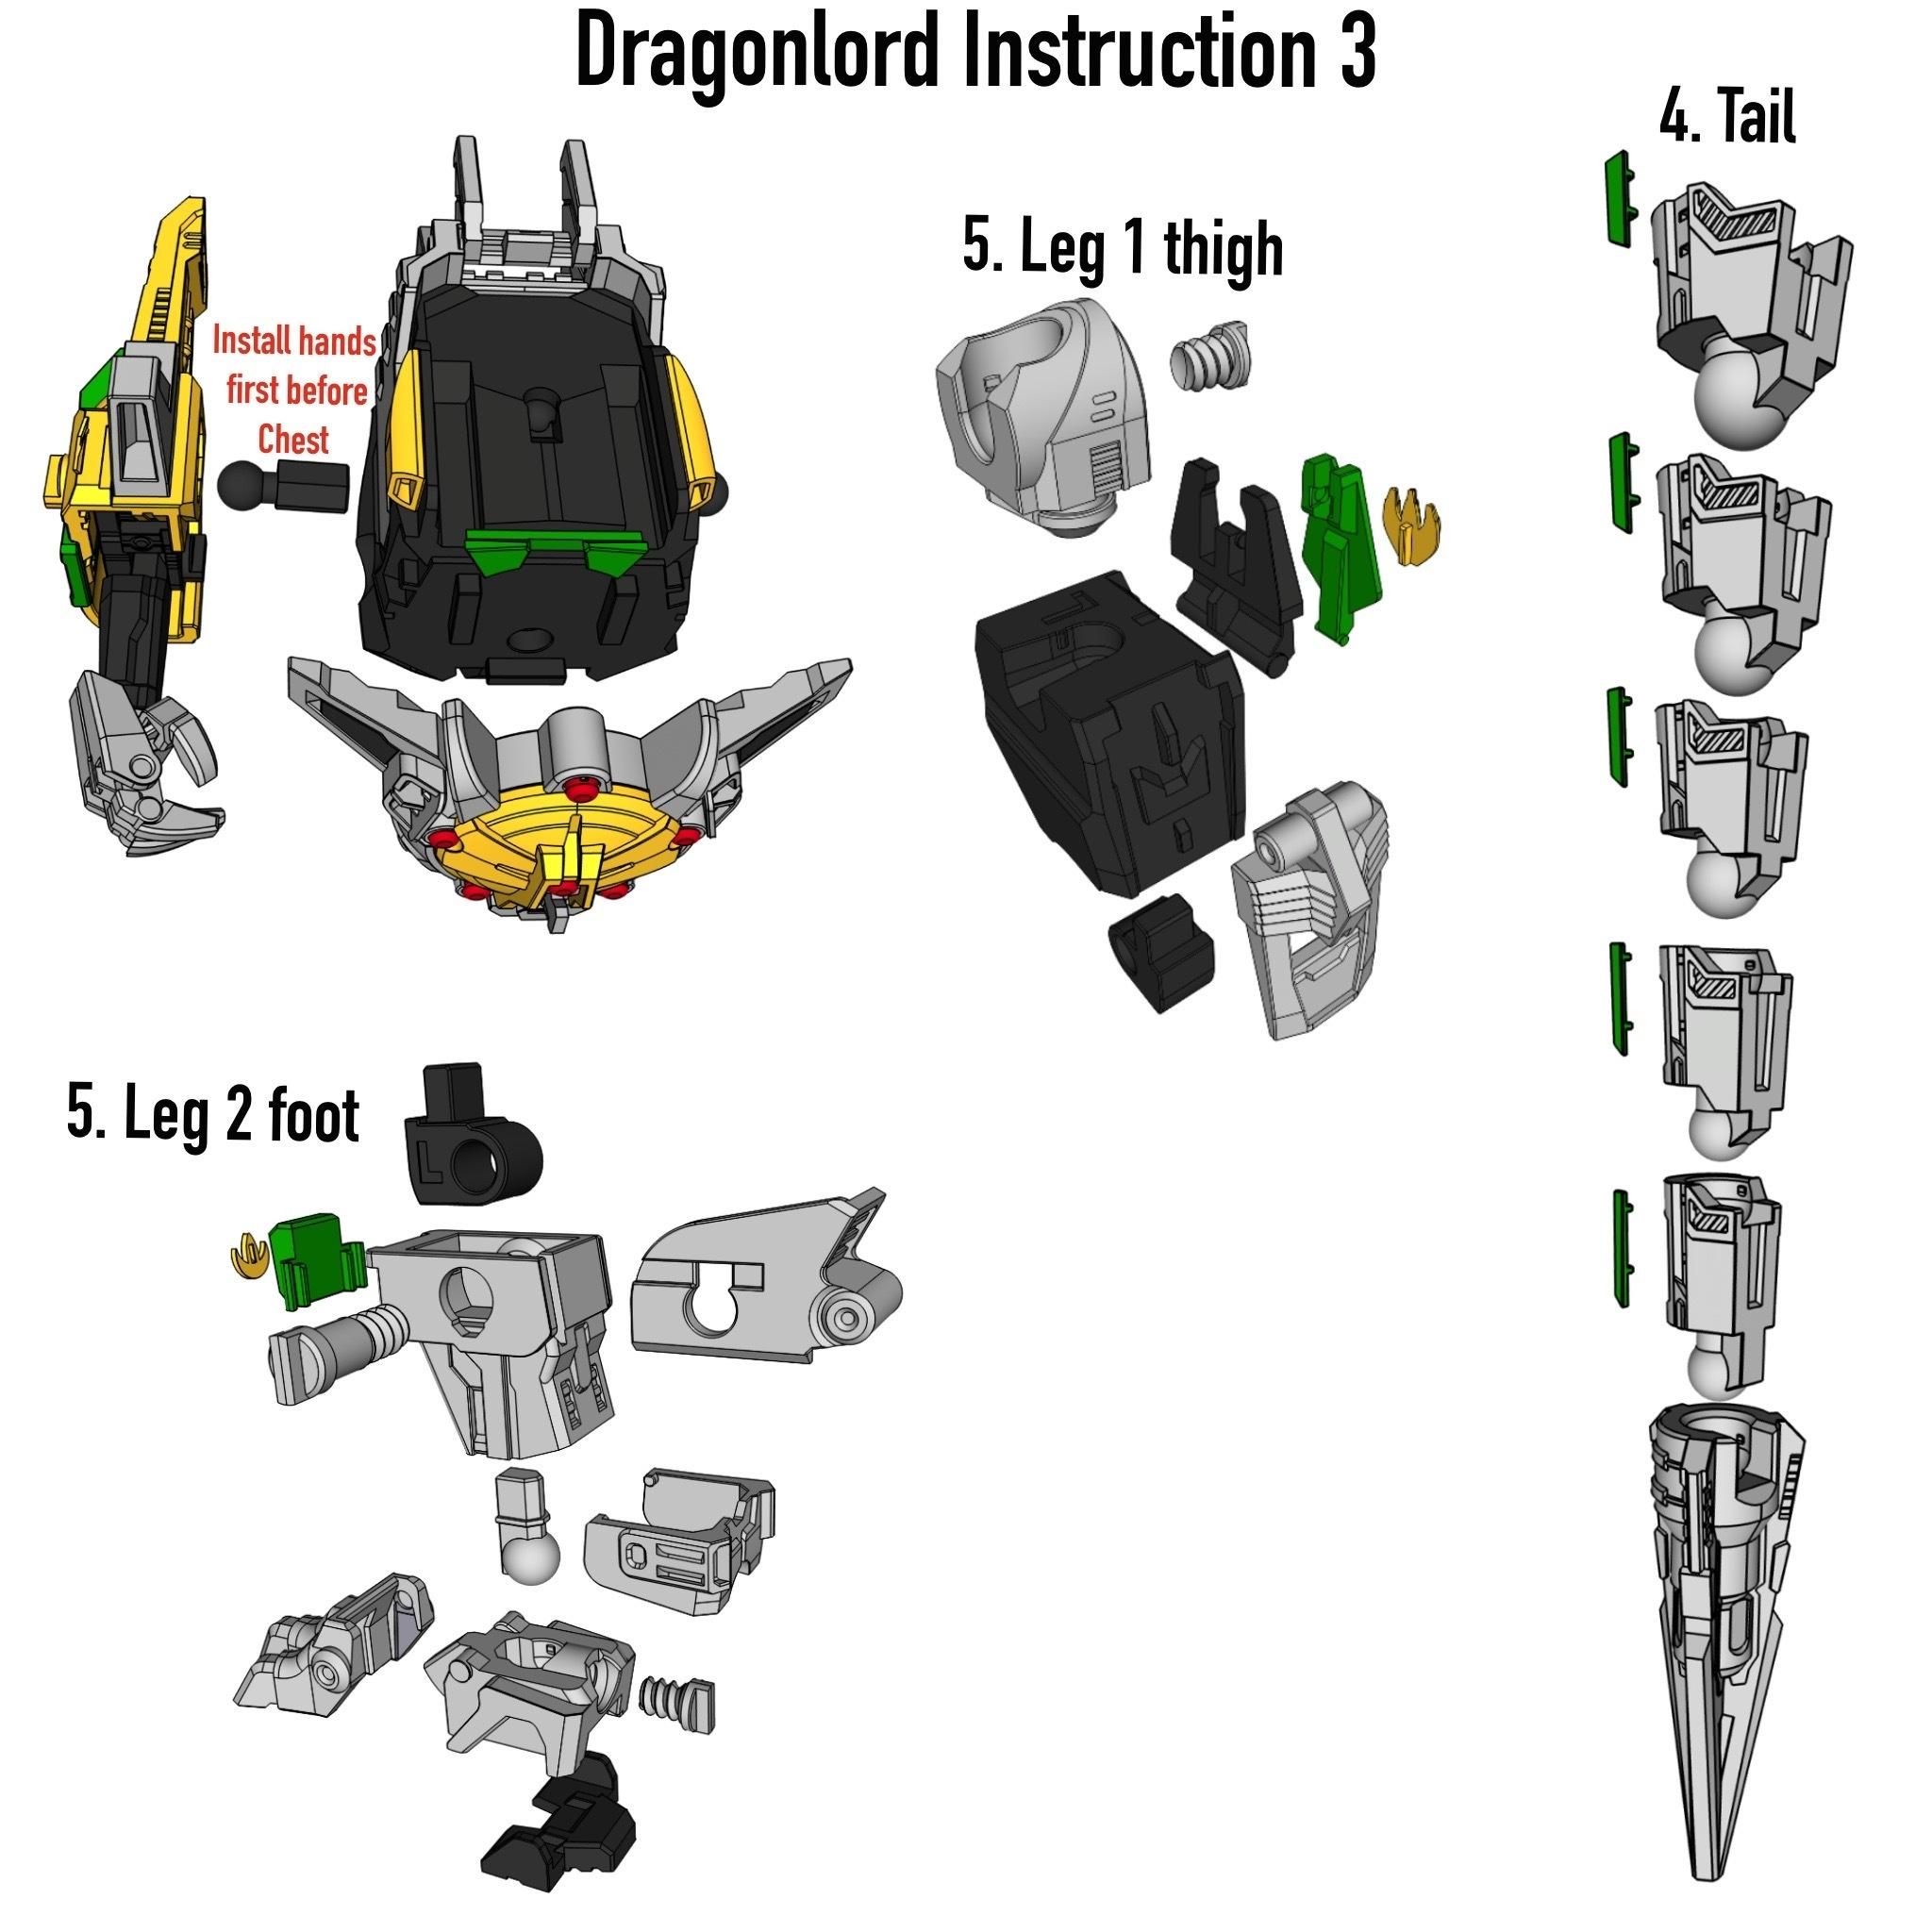 Dragon_Istruction3.JPG Download STL file ARTICULATED DRAGONLORD (not Dragonzord) - NO SUPPORT • 3D printer model, Toymakr3D